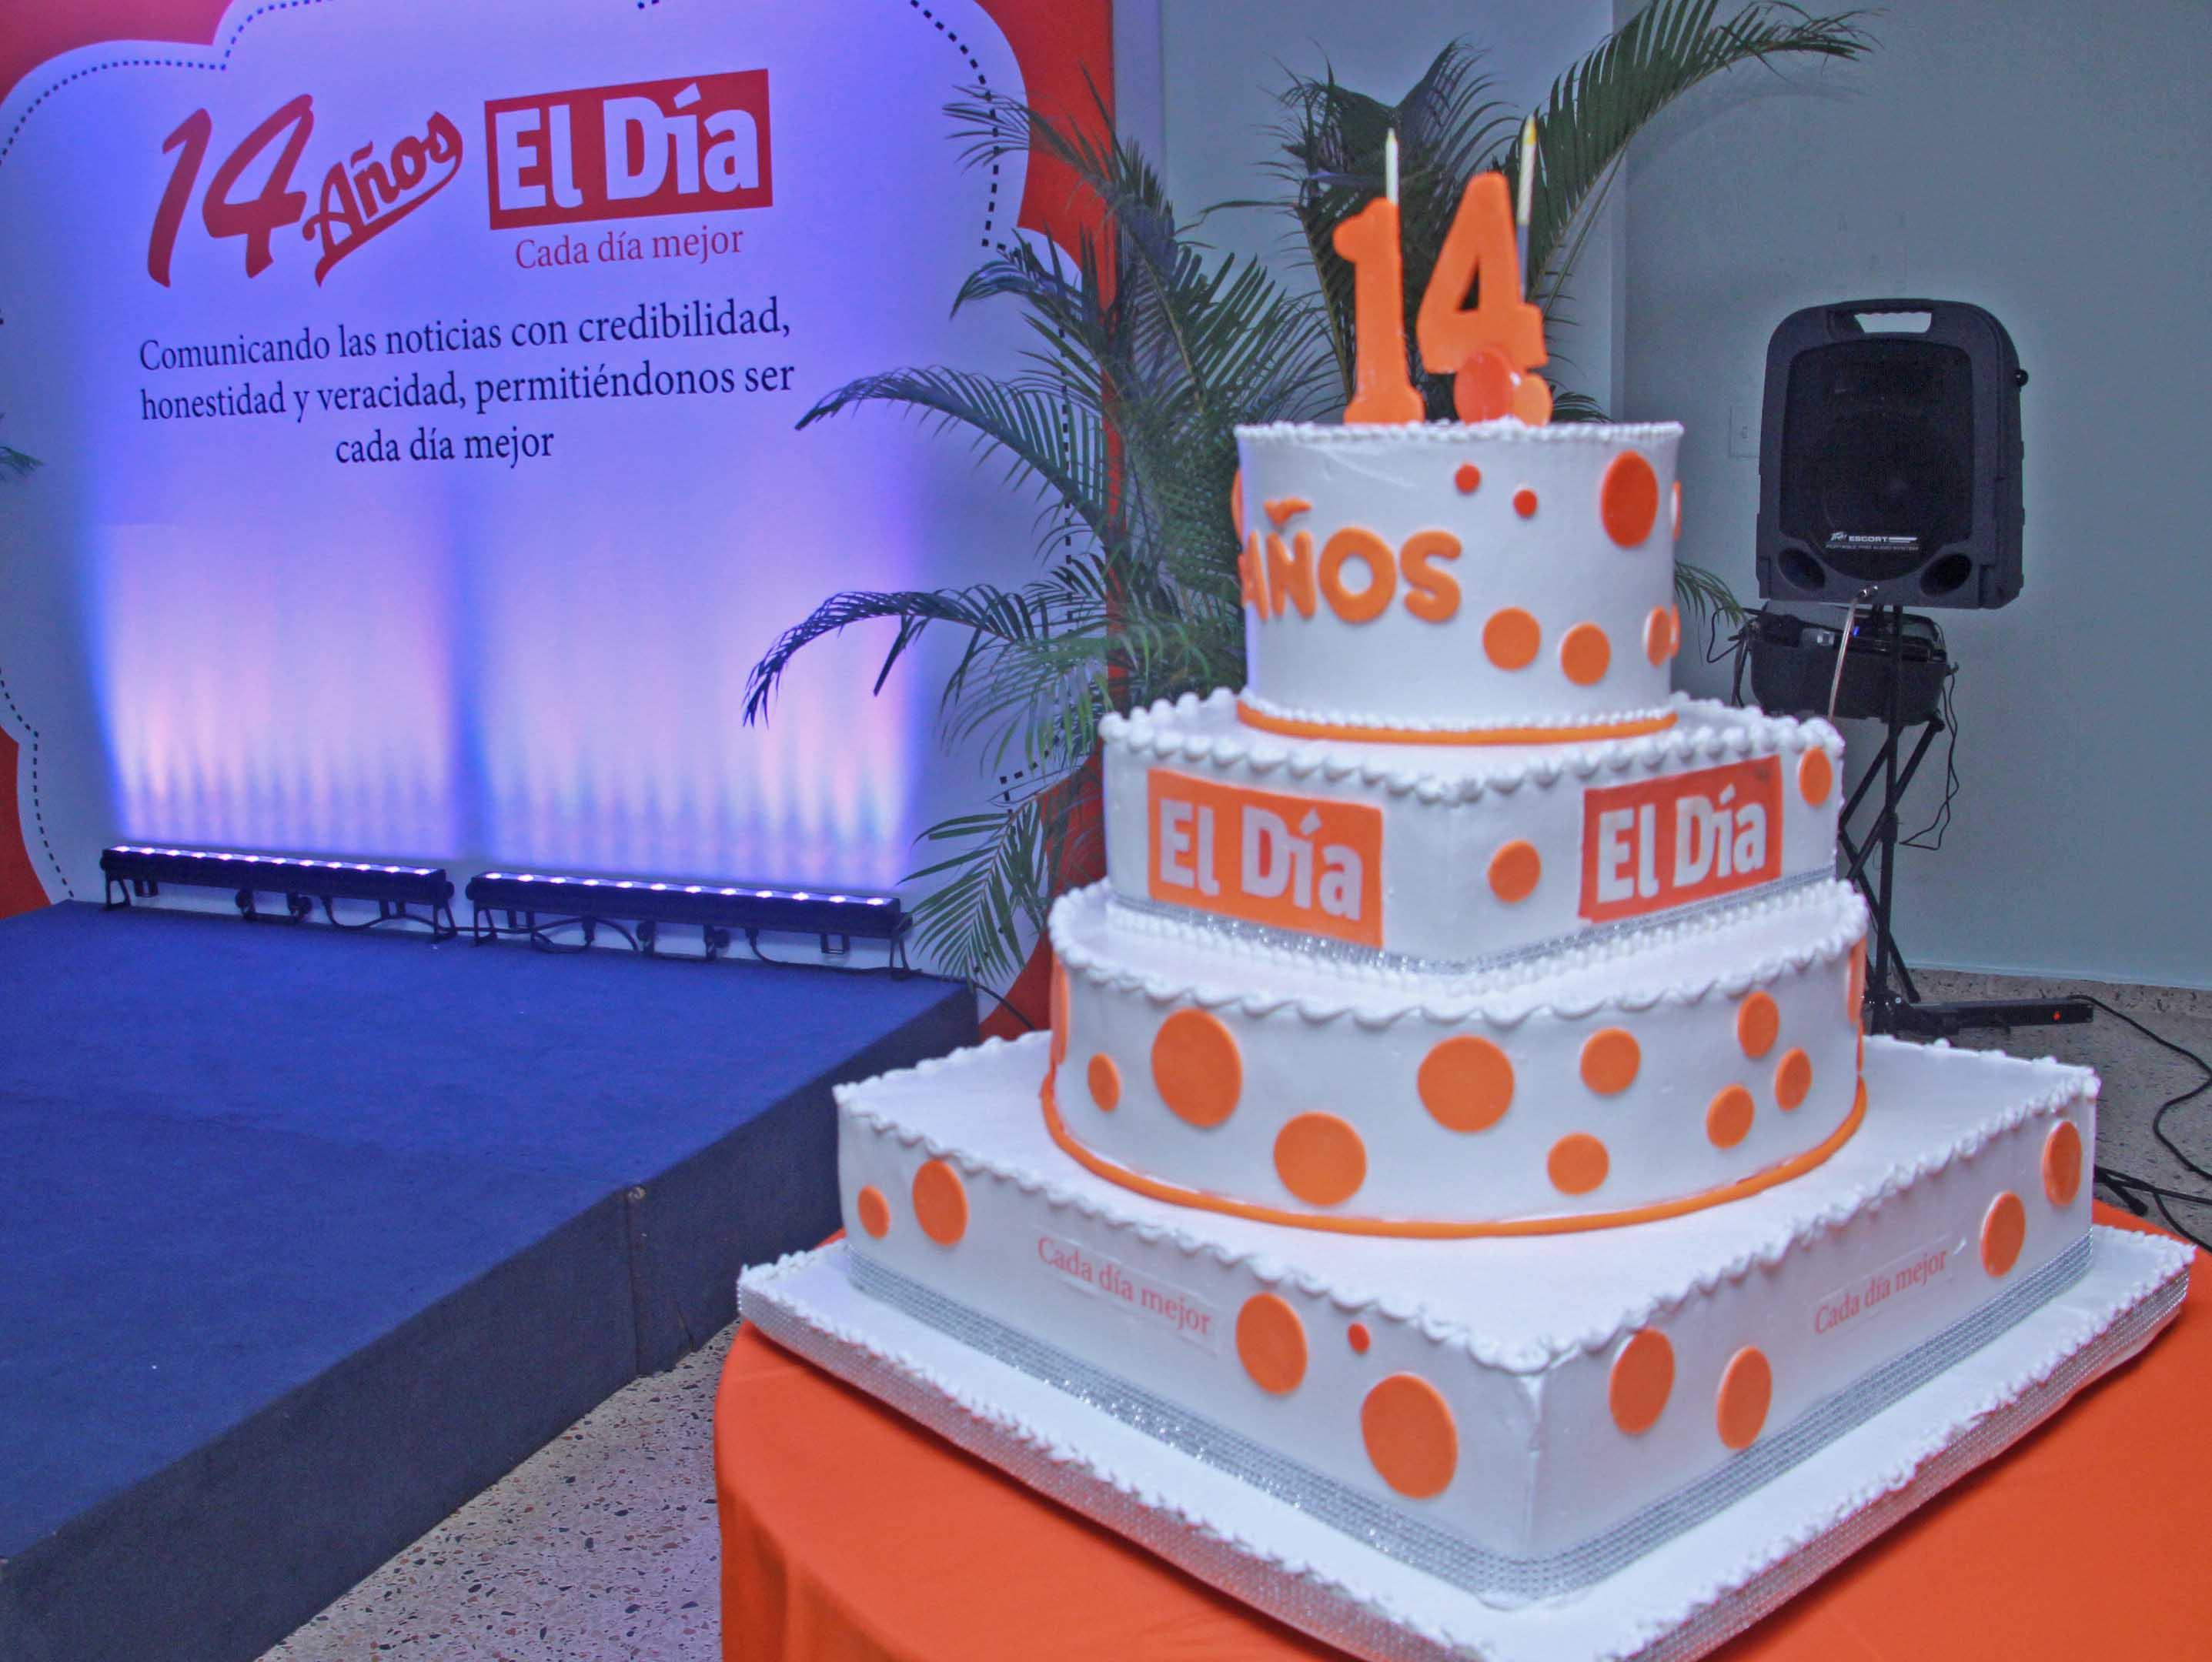 Celebracion del 14 aniversario periodico El Dia. Foto: Elieser Tapia.